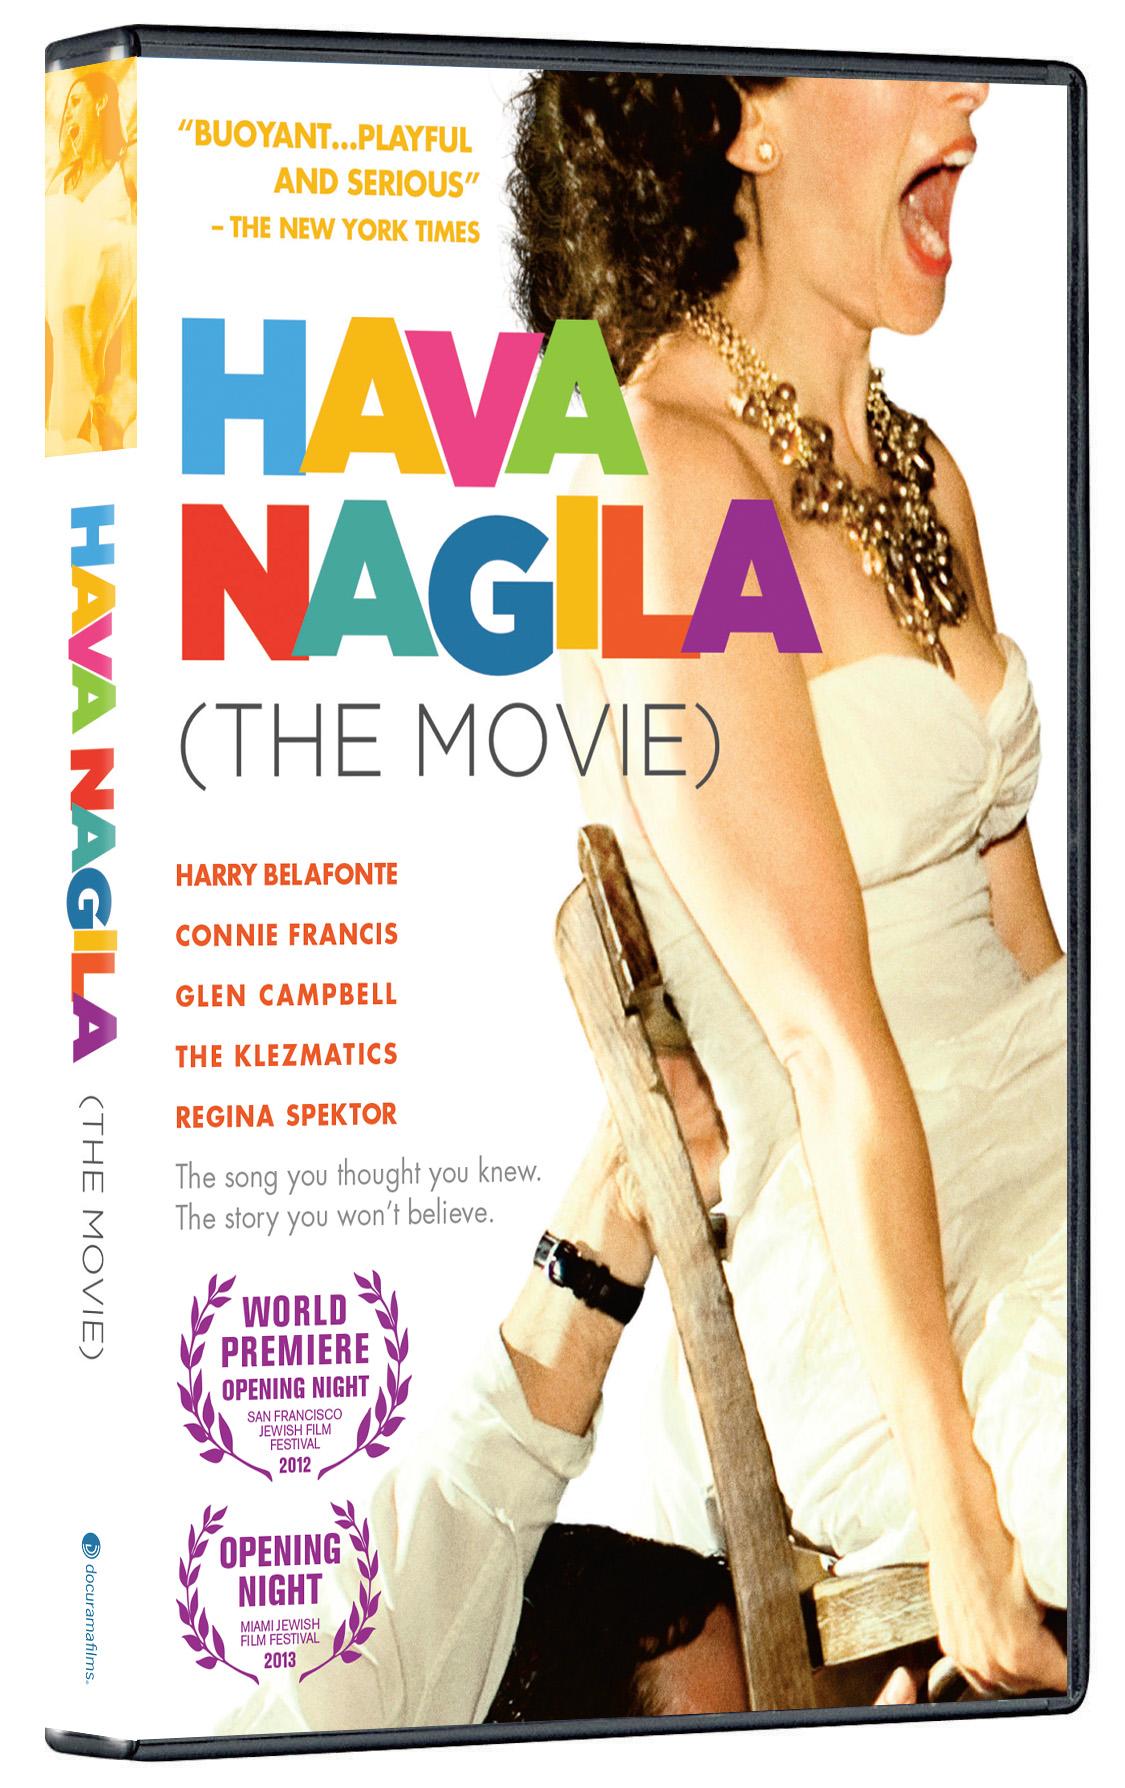 Hava Nagila: The Movie DVD Review